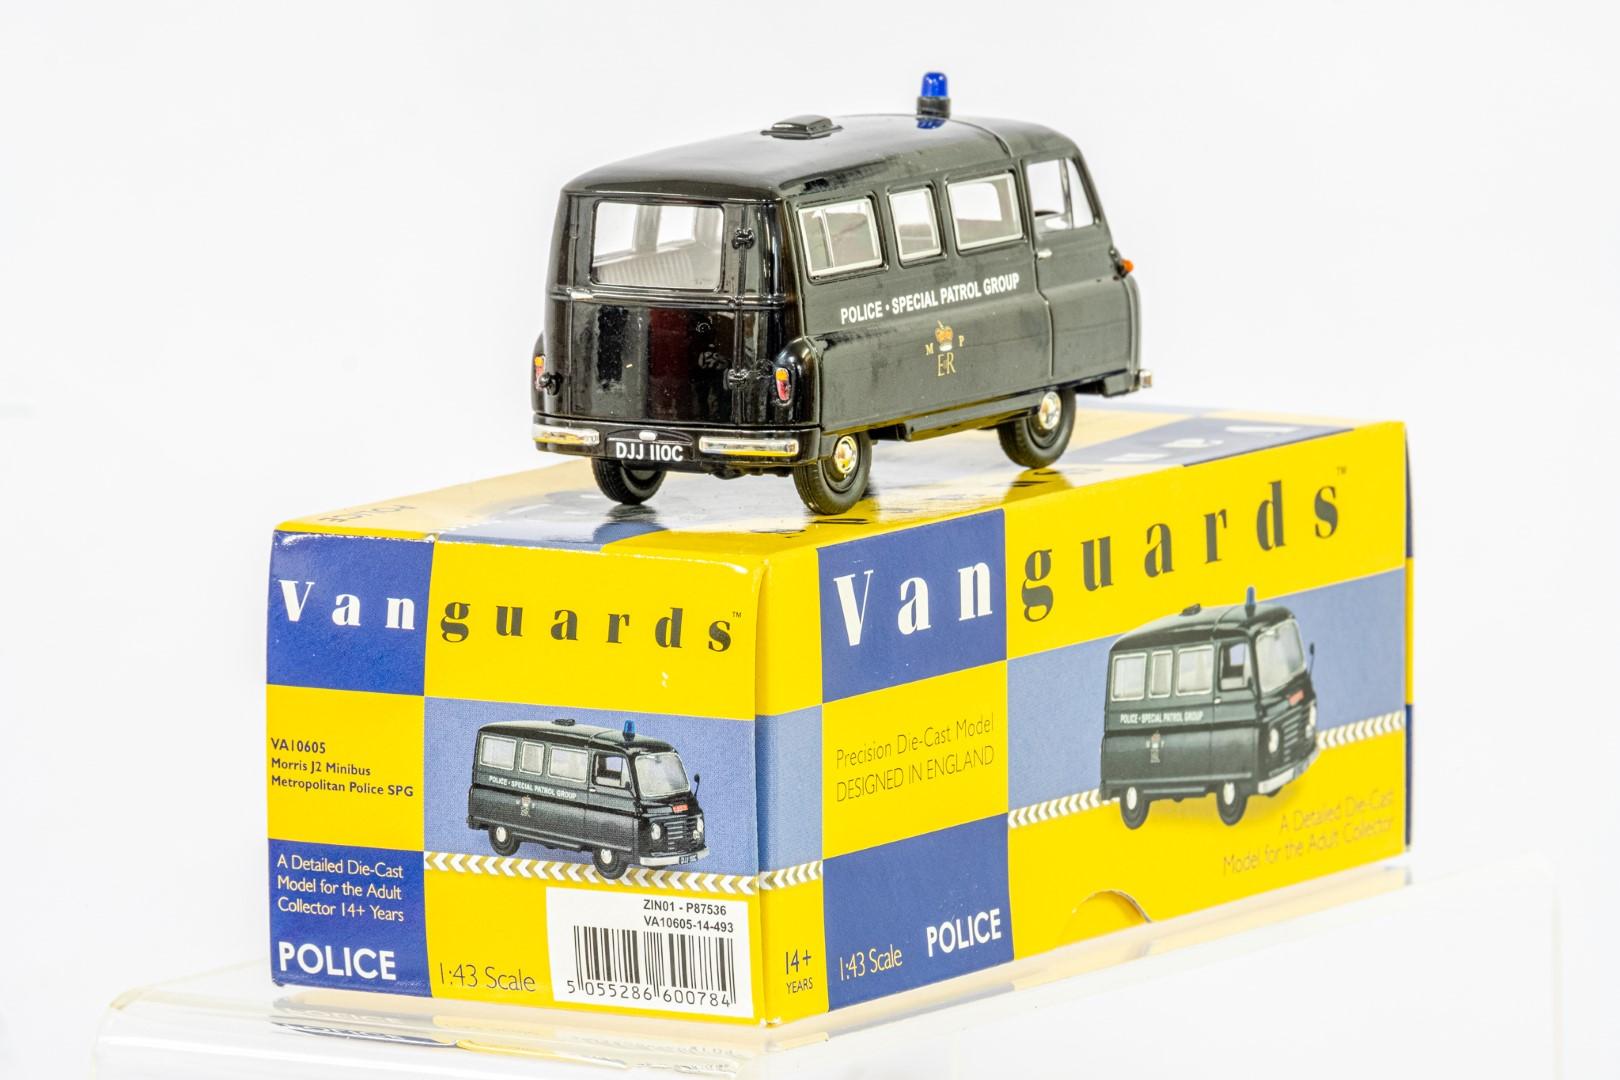 Vanguards Morris J2 Minibus - Metropolitan Police SPG - Image 4 of 6